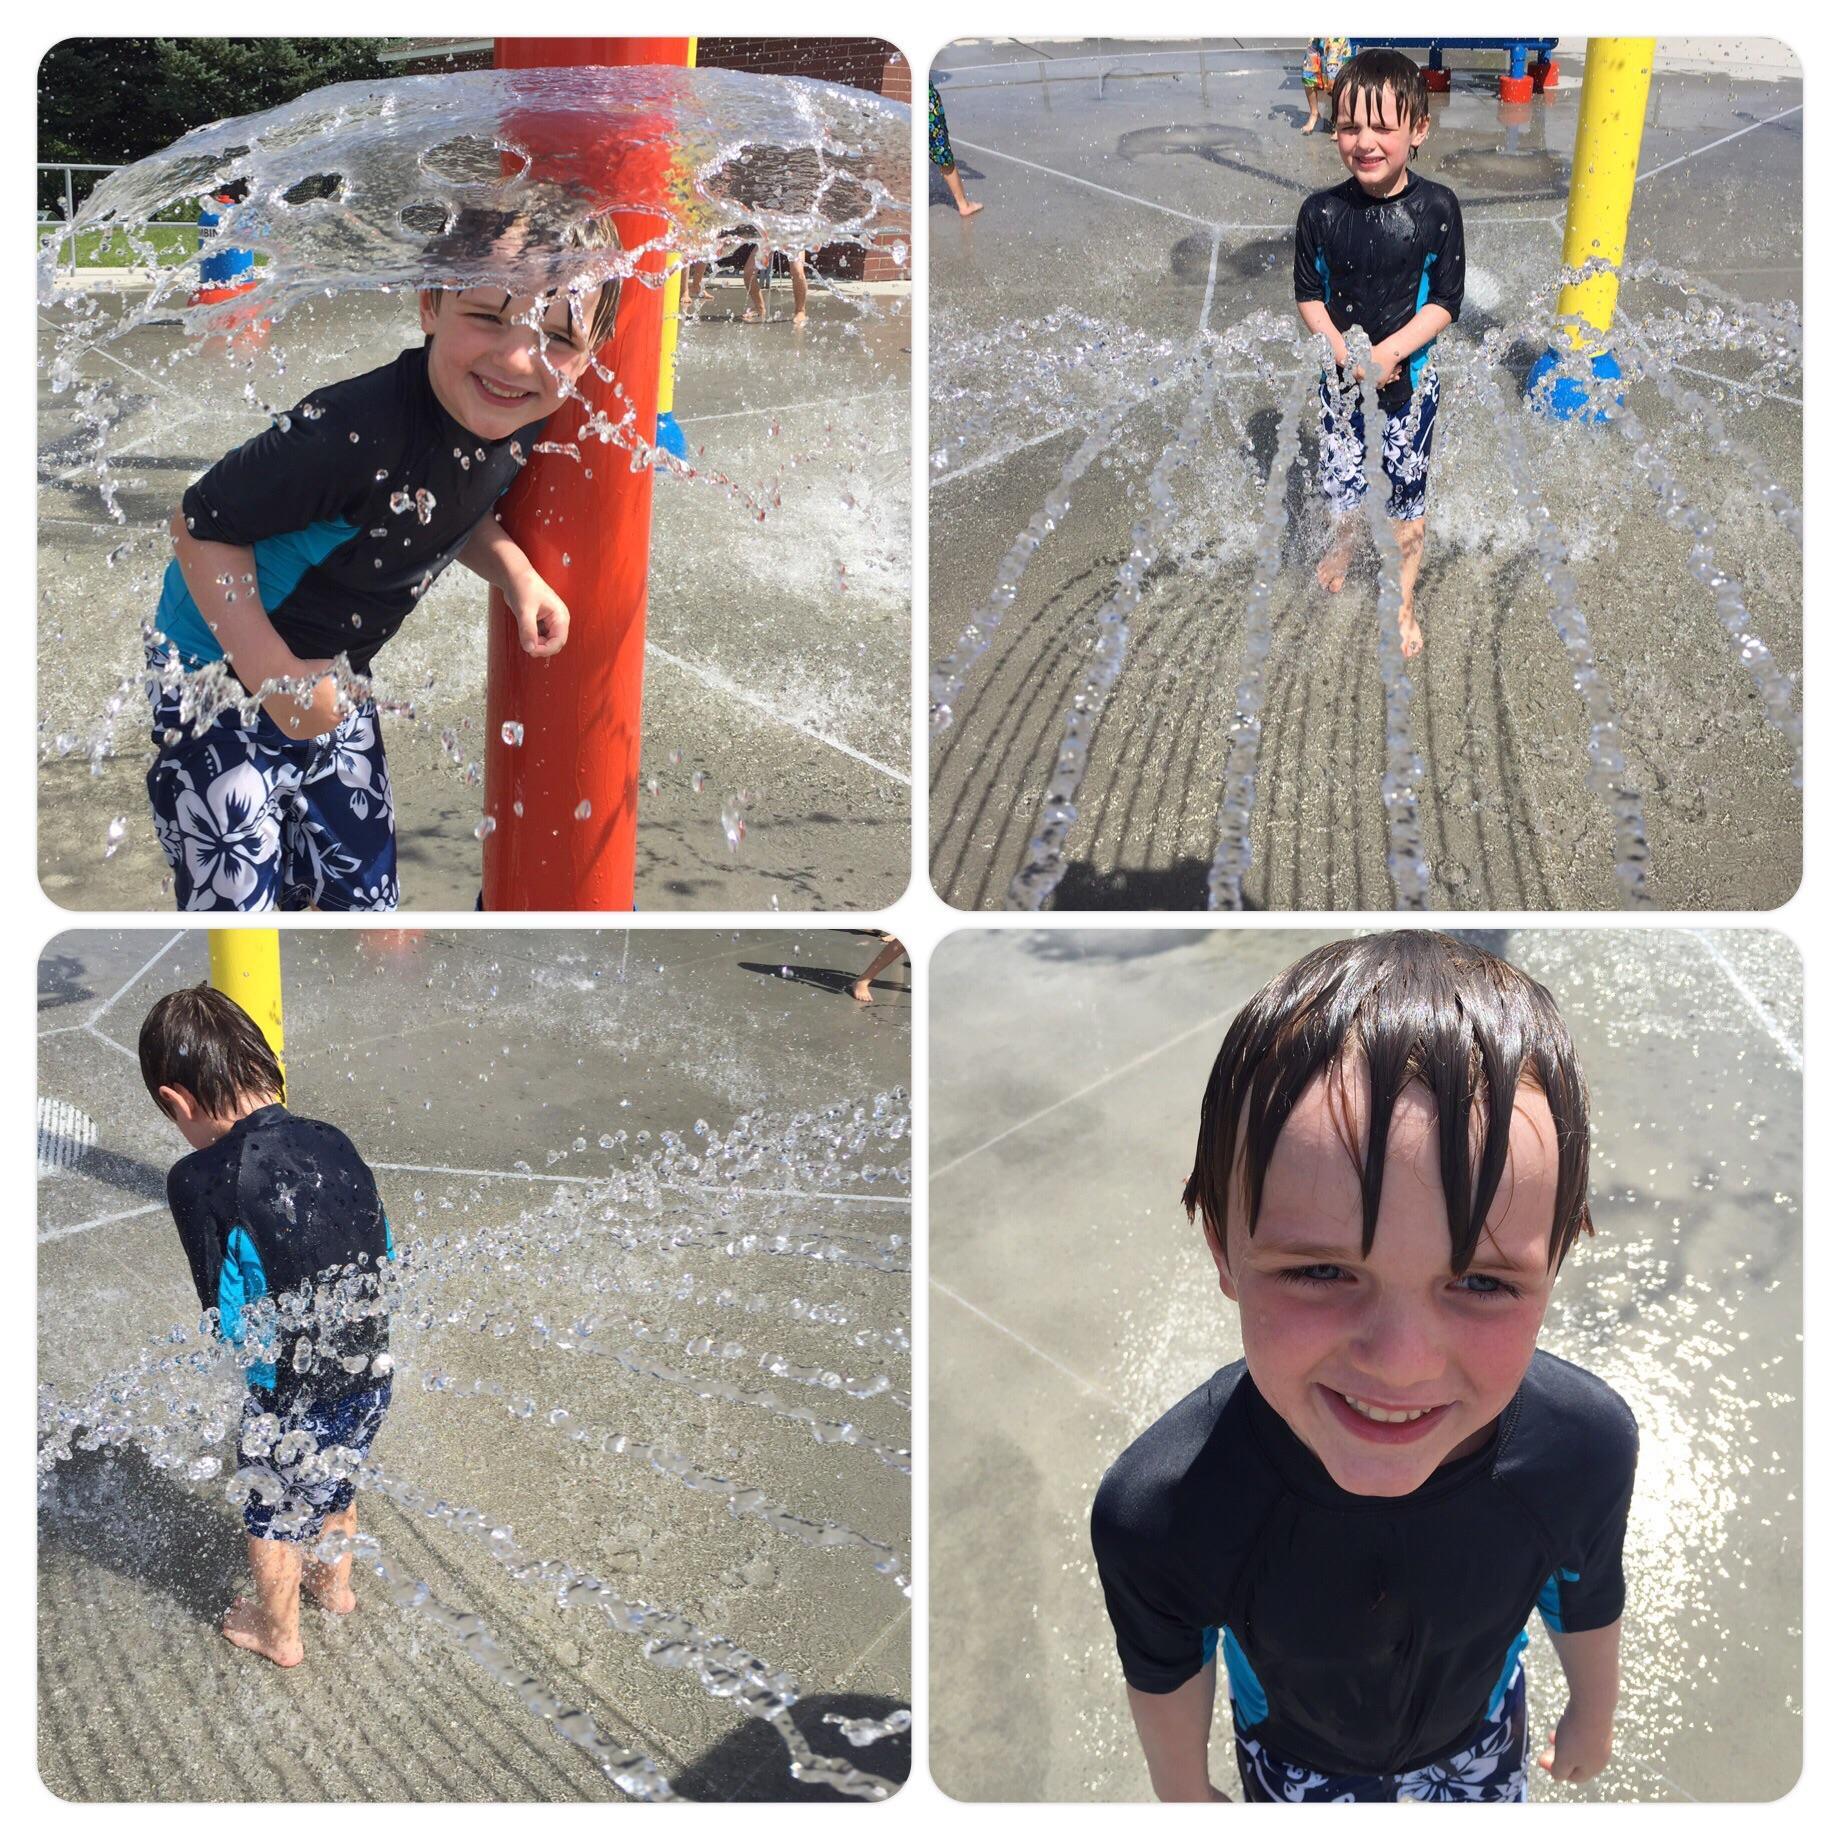 Splash pad fun. Nicholas loves getting wet! 7.31.15